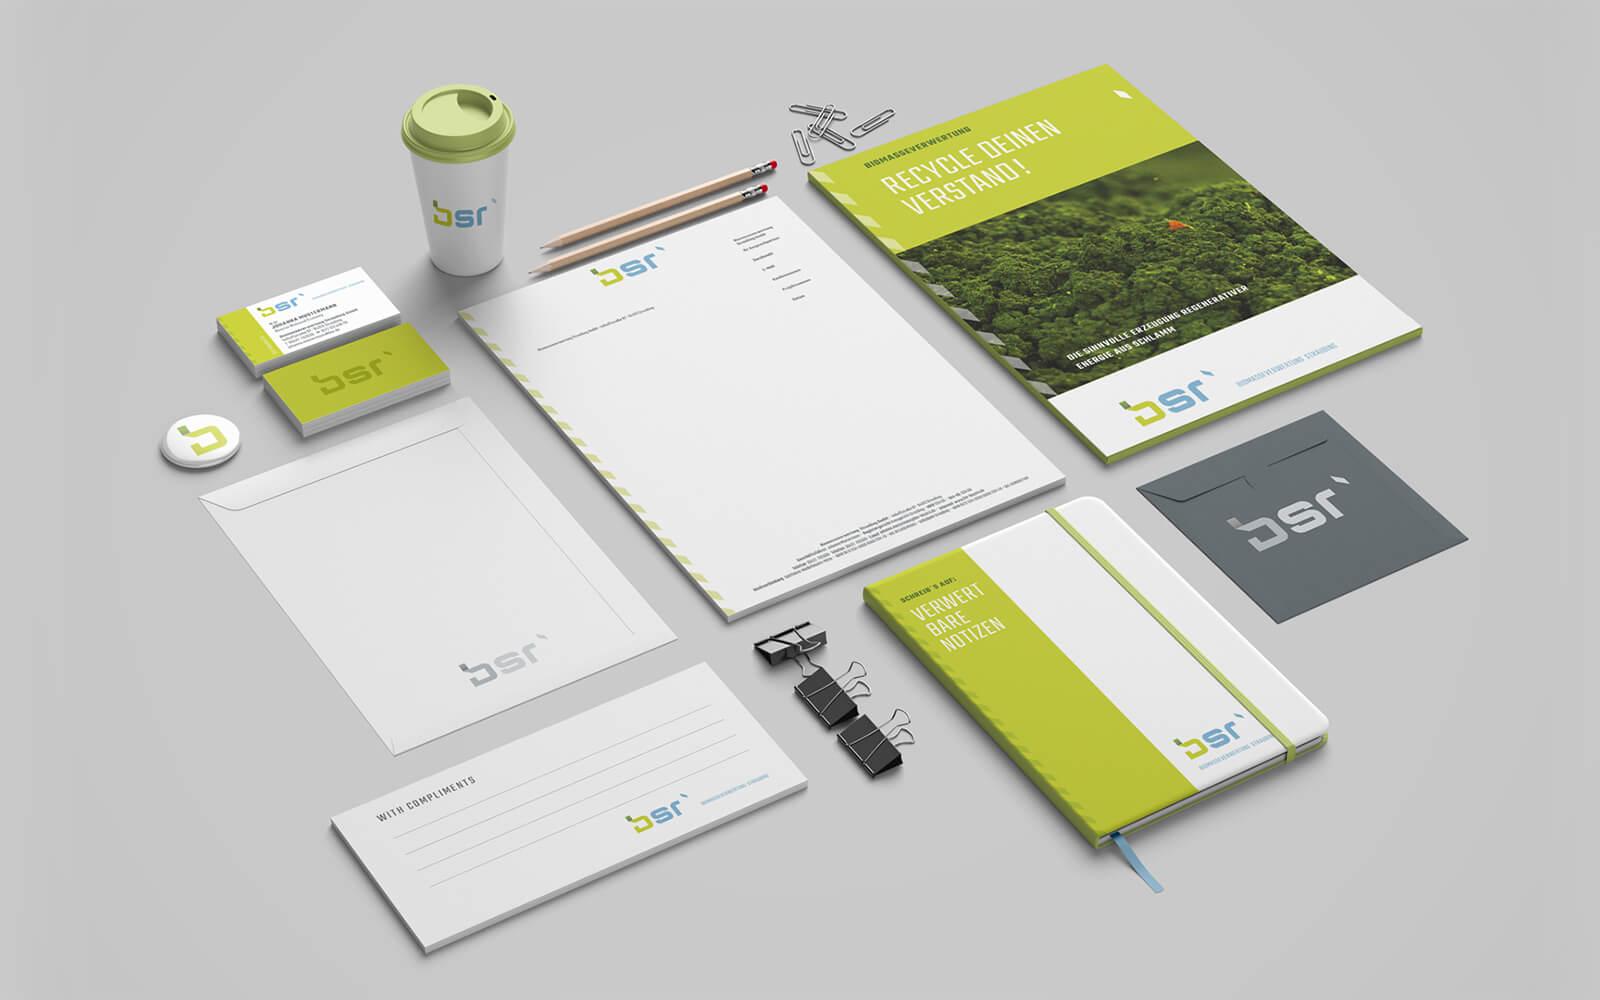 bsr – Corporate Design